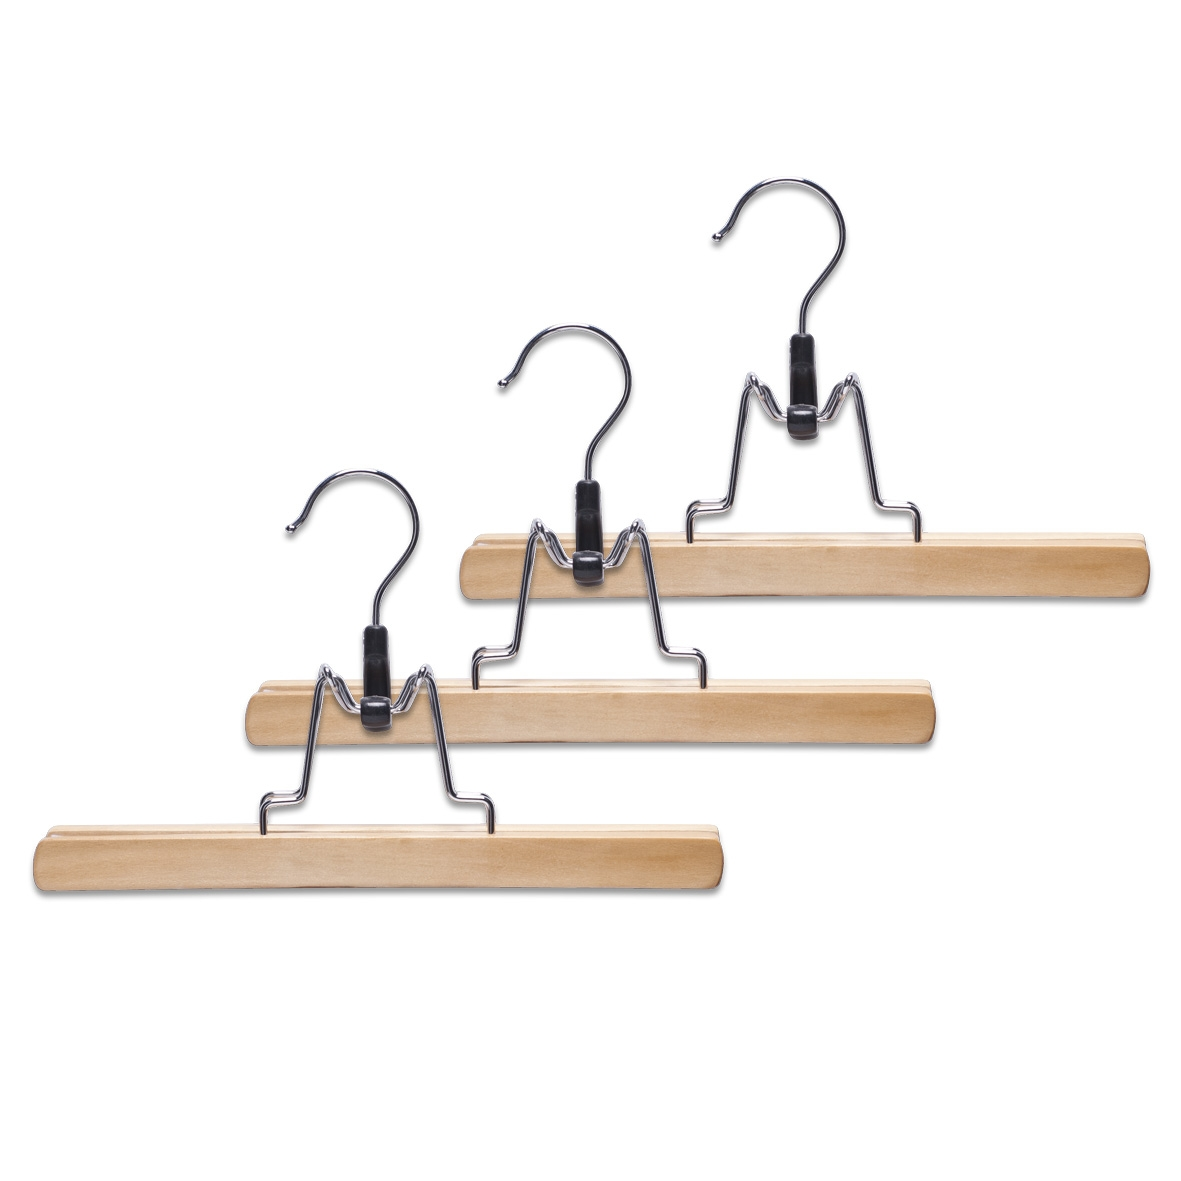 Set umerase din metal si lemn pentru pantaloni, Belt Natural, l25xH15 cm, 3 bucati